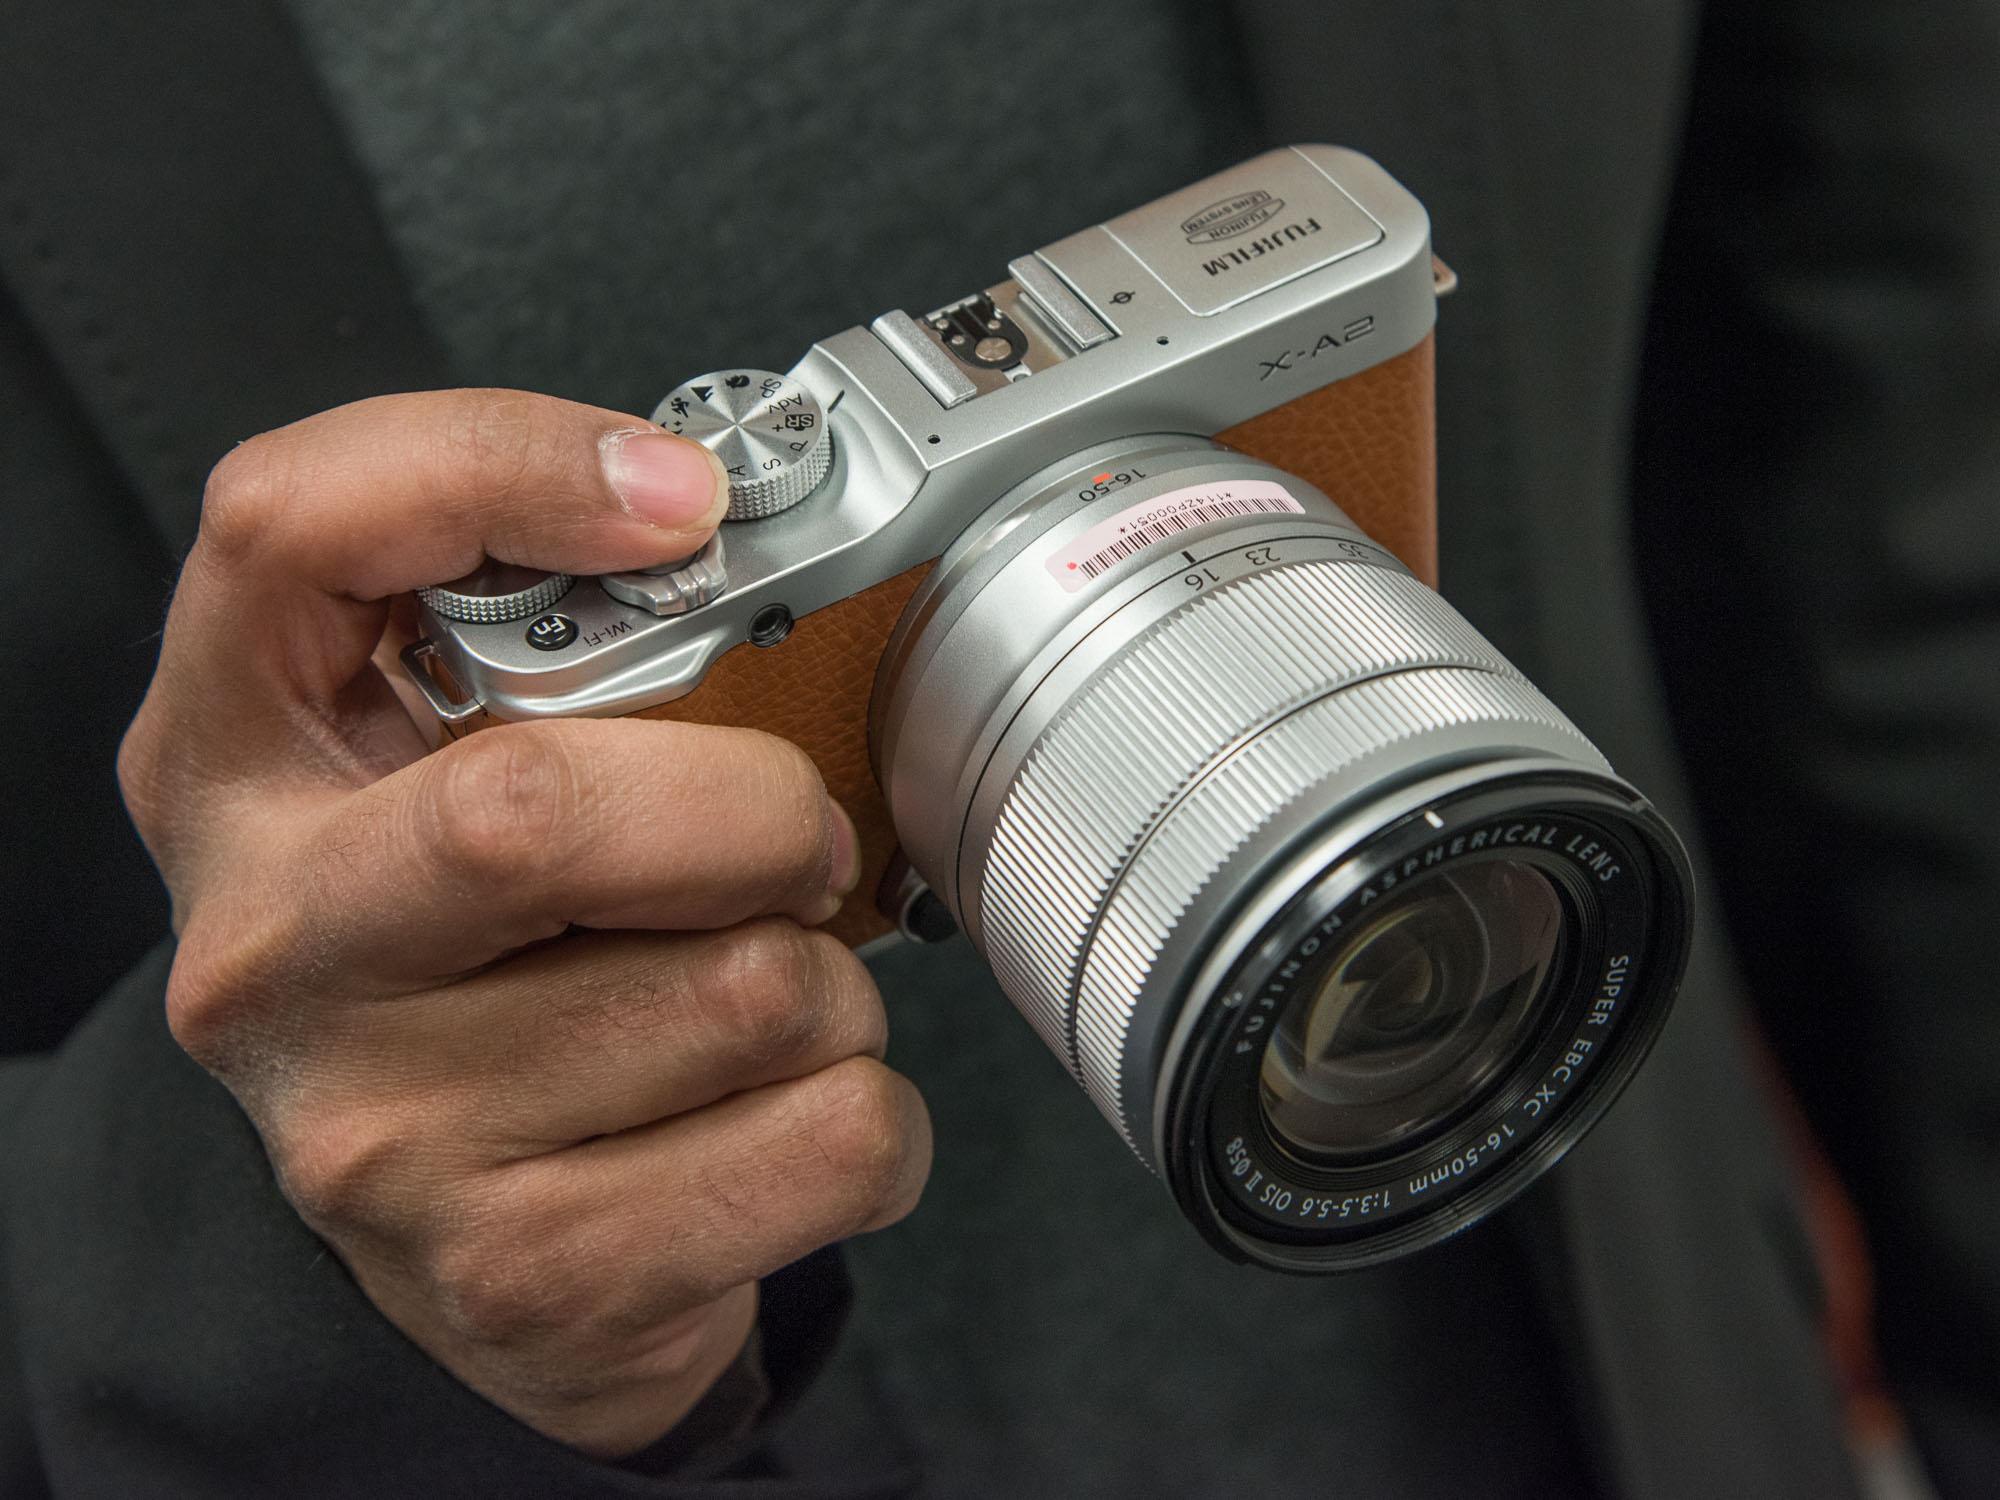 DP-iot Camera Slim Lens Mount Adapter Ring M42-NEX for M42 Lens for Sony NEX E NEX3 for Sony E-Mount Body NEX3 NEX5 NEX6 NEX-5N NEX-7